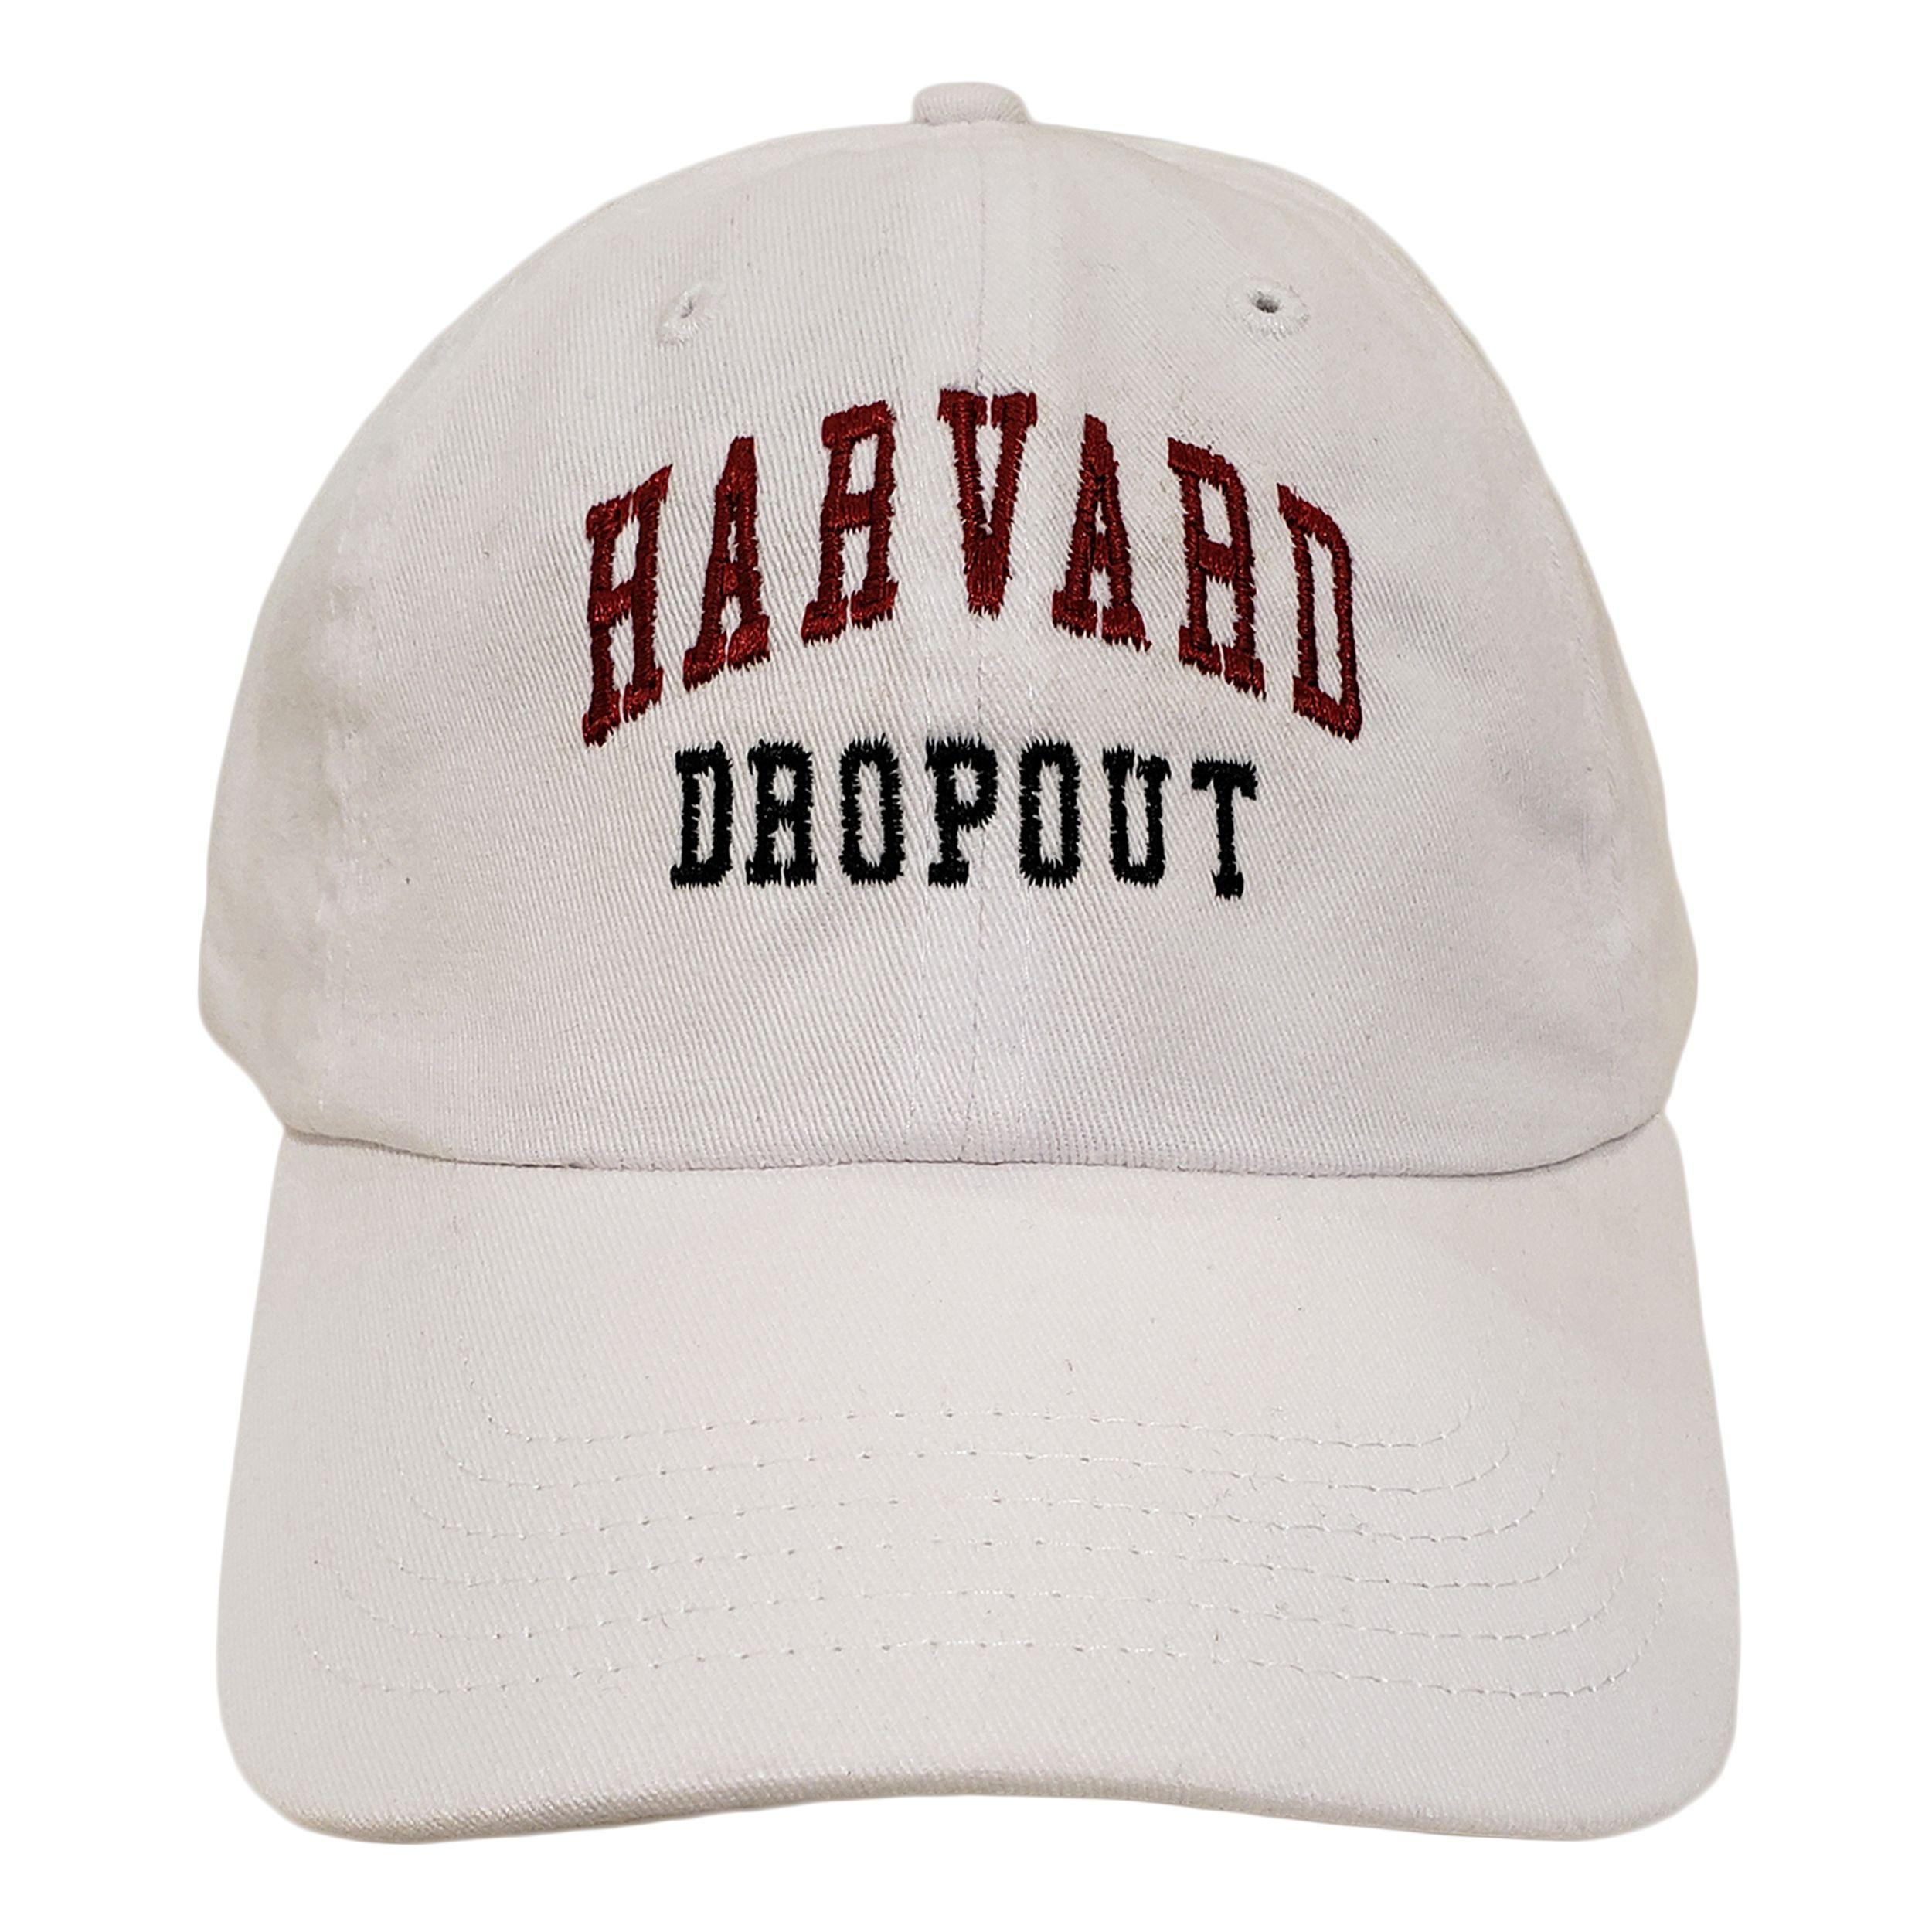 4e7ff446a07f2 Harvard Dropout Hat Panel Hat